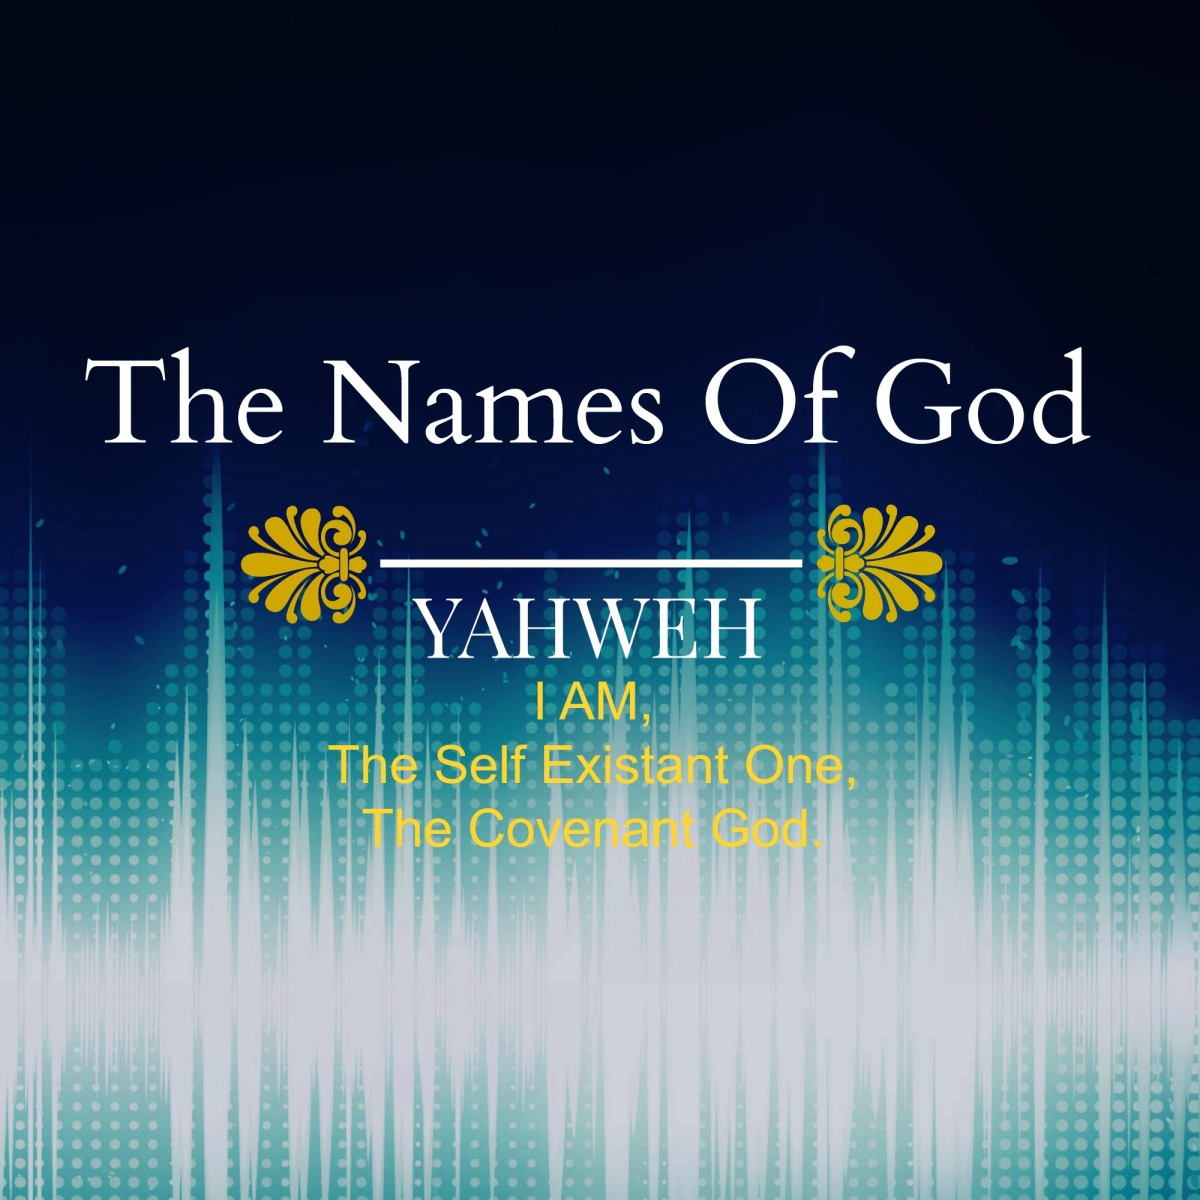 Names Of God- YAHWEH | Six Measures Of Barley